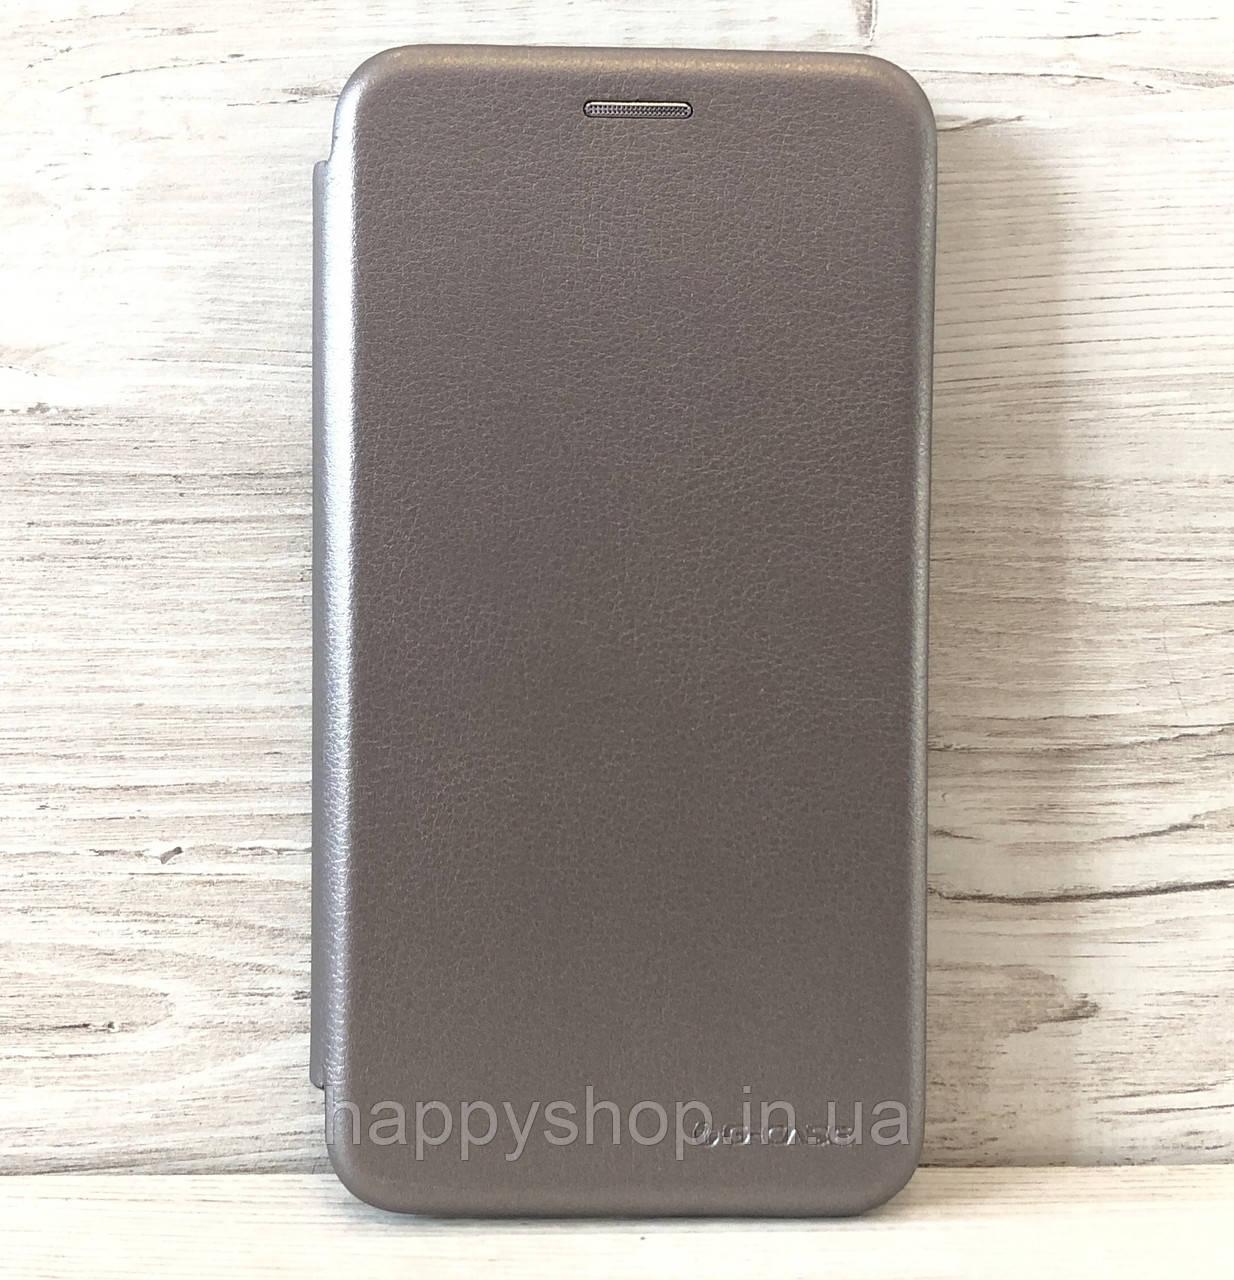 Чехол-книжка G-Case для Samsung Galaxy A8 2018 (A530) Серый